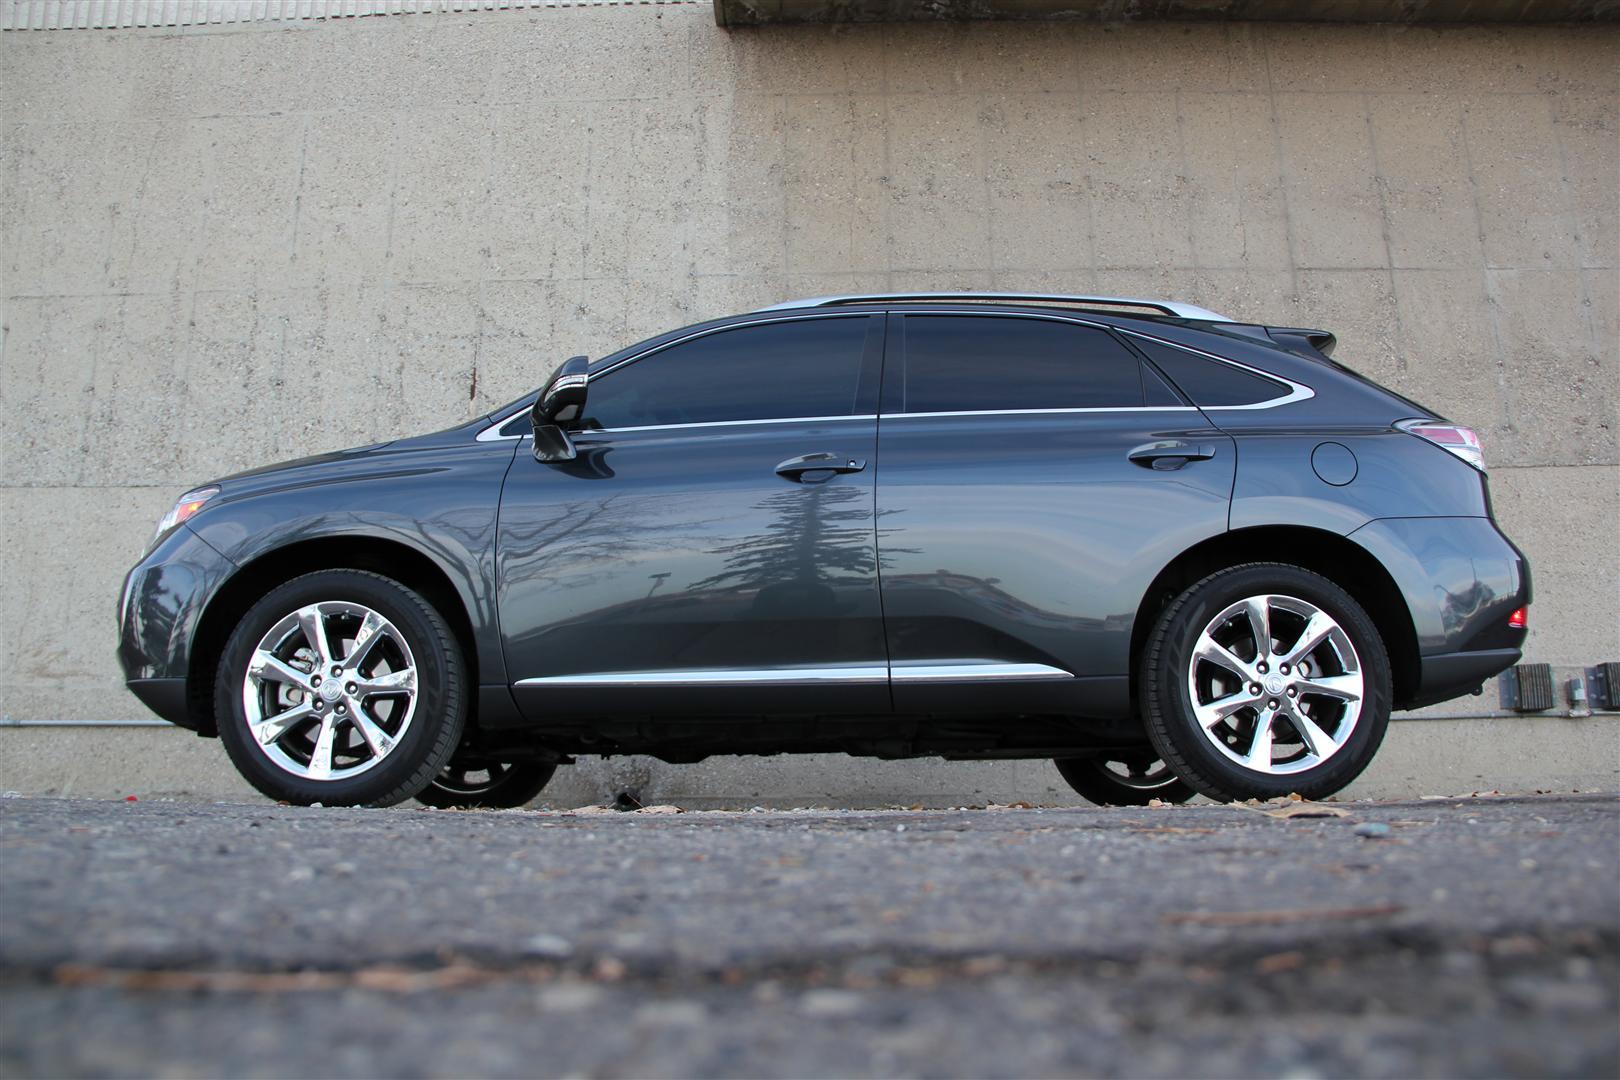 2010 Lexus RX350 AWD Ultra Premium Chrome Wheel Pkg